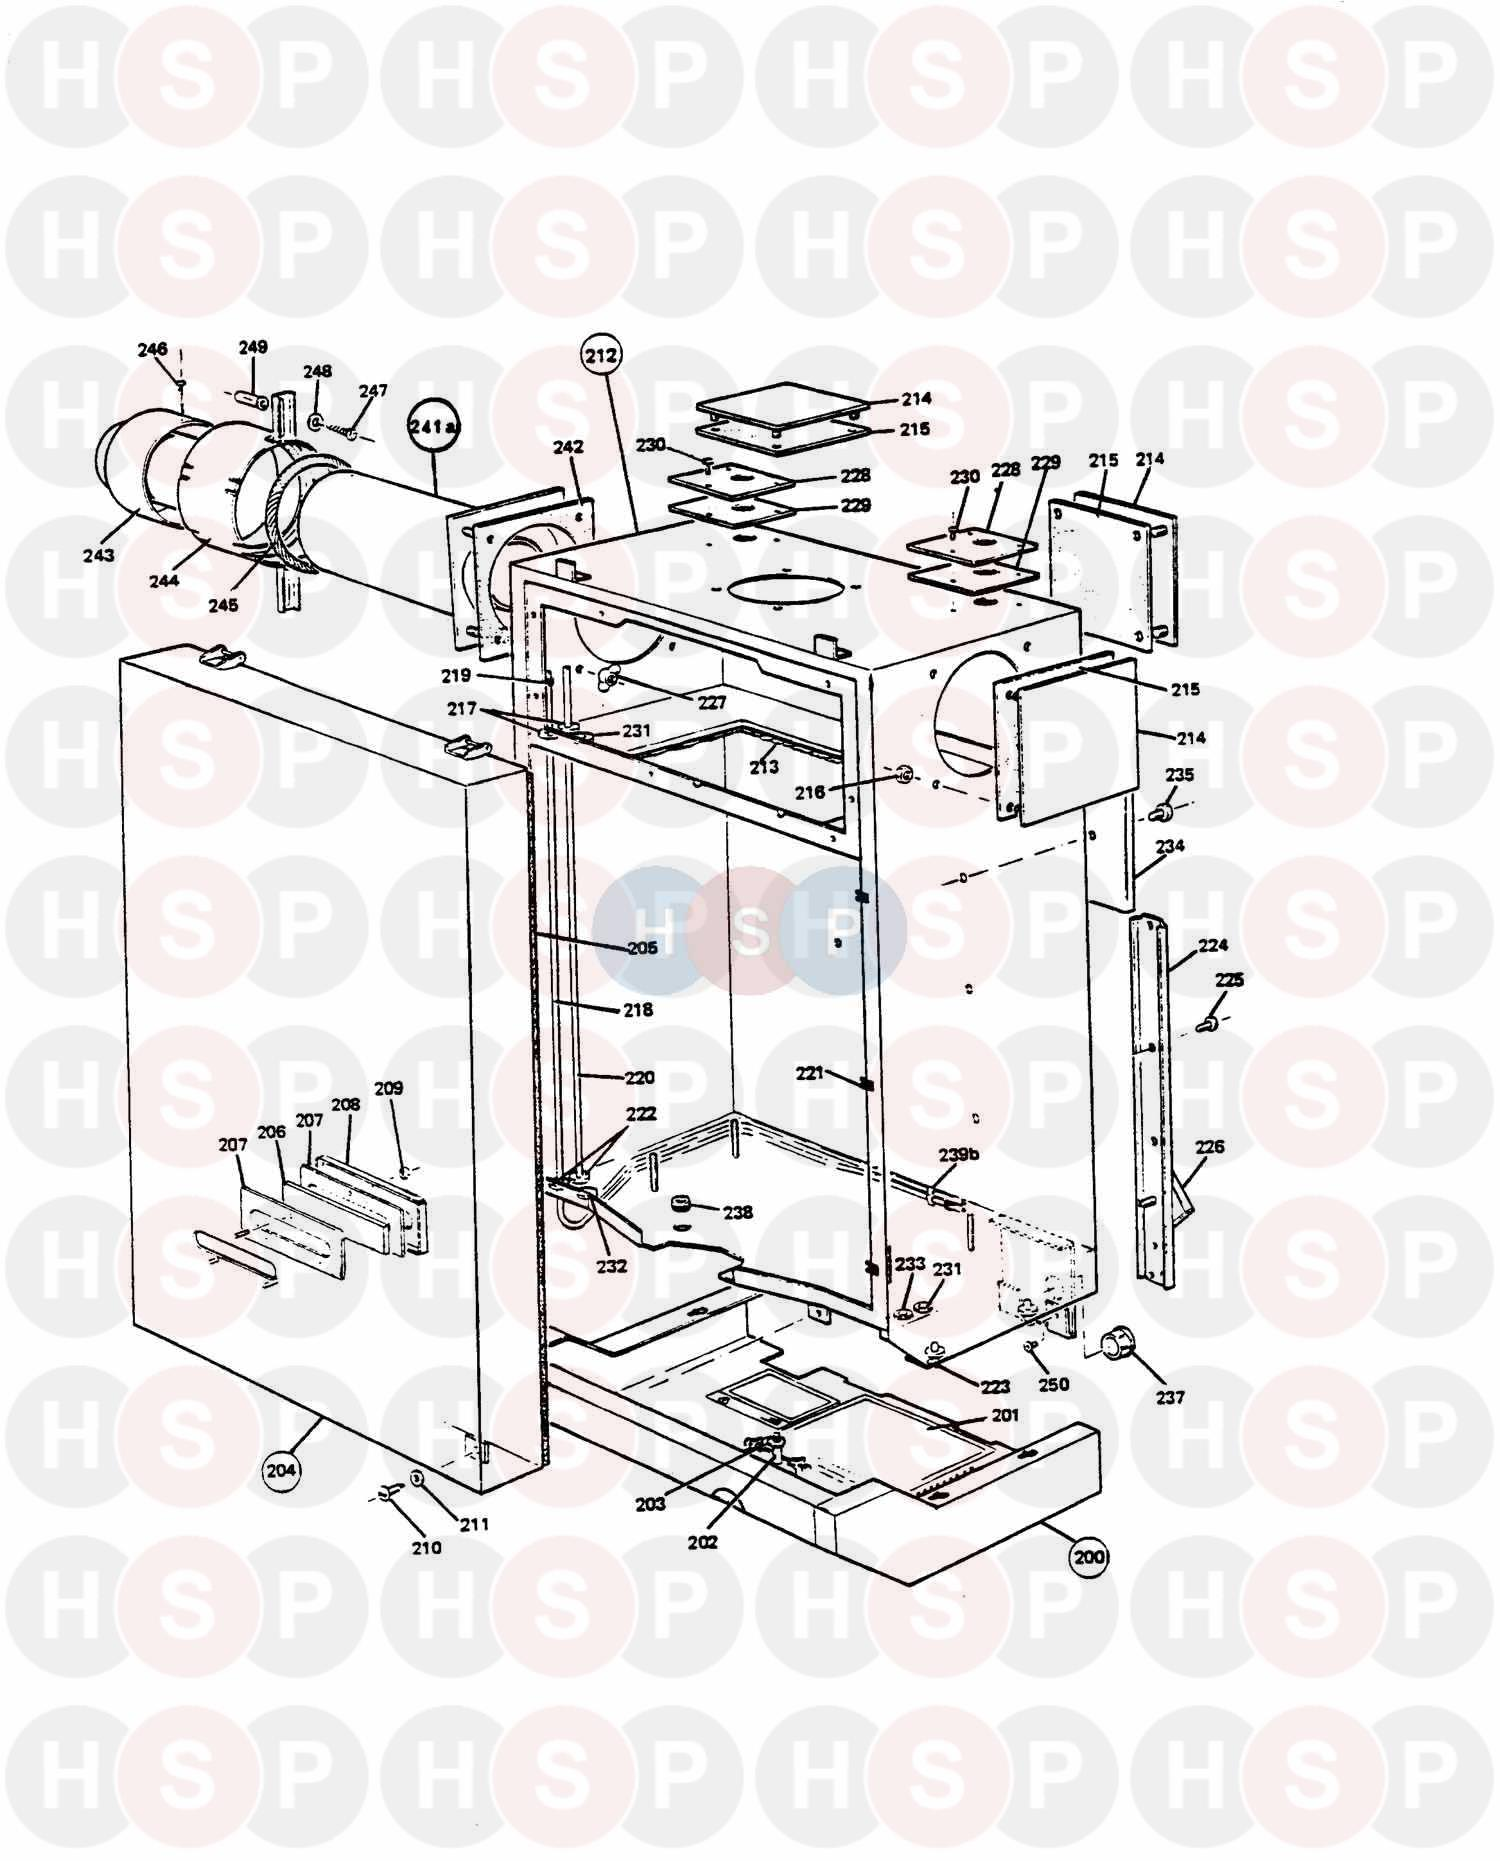 Potterton NETAHEAT PROFILE 50E (Outer Case & Flue) Diagram